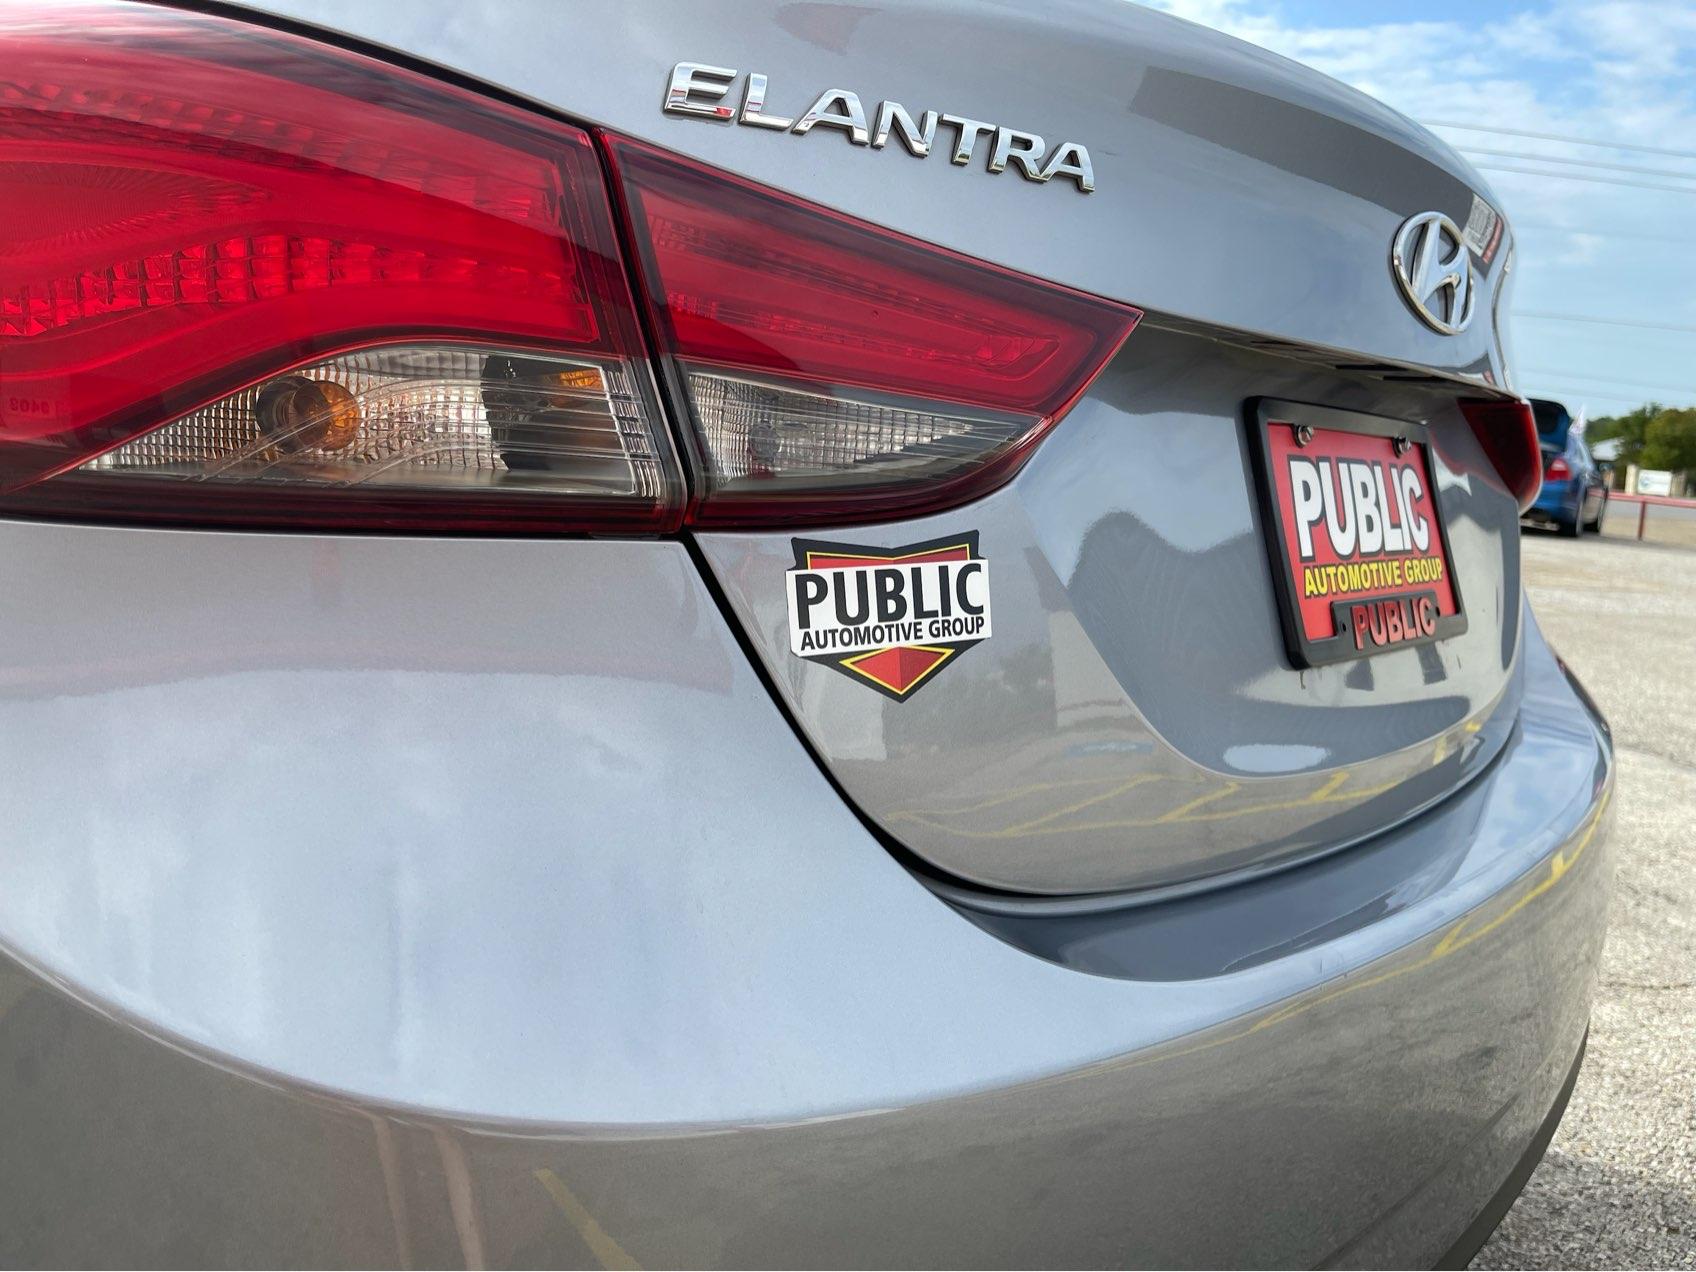 used vehicle - Sedan HYUNDAI ELANTRA 2016